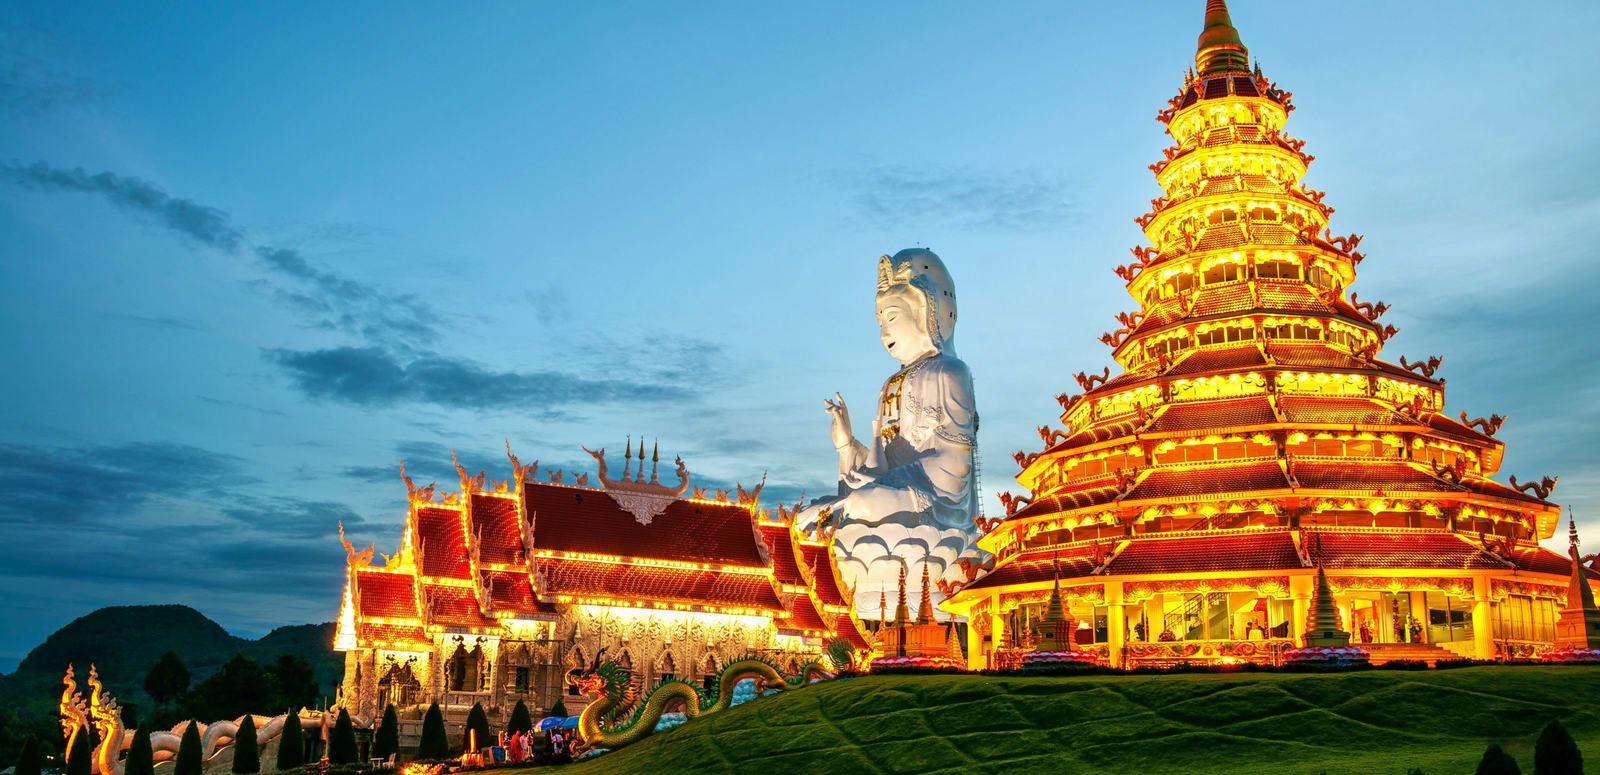 1565777567_wat-huai-pla-kung-temple-footage-086149834_prevstill.jpeg